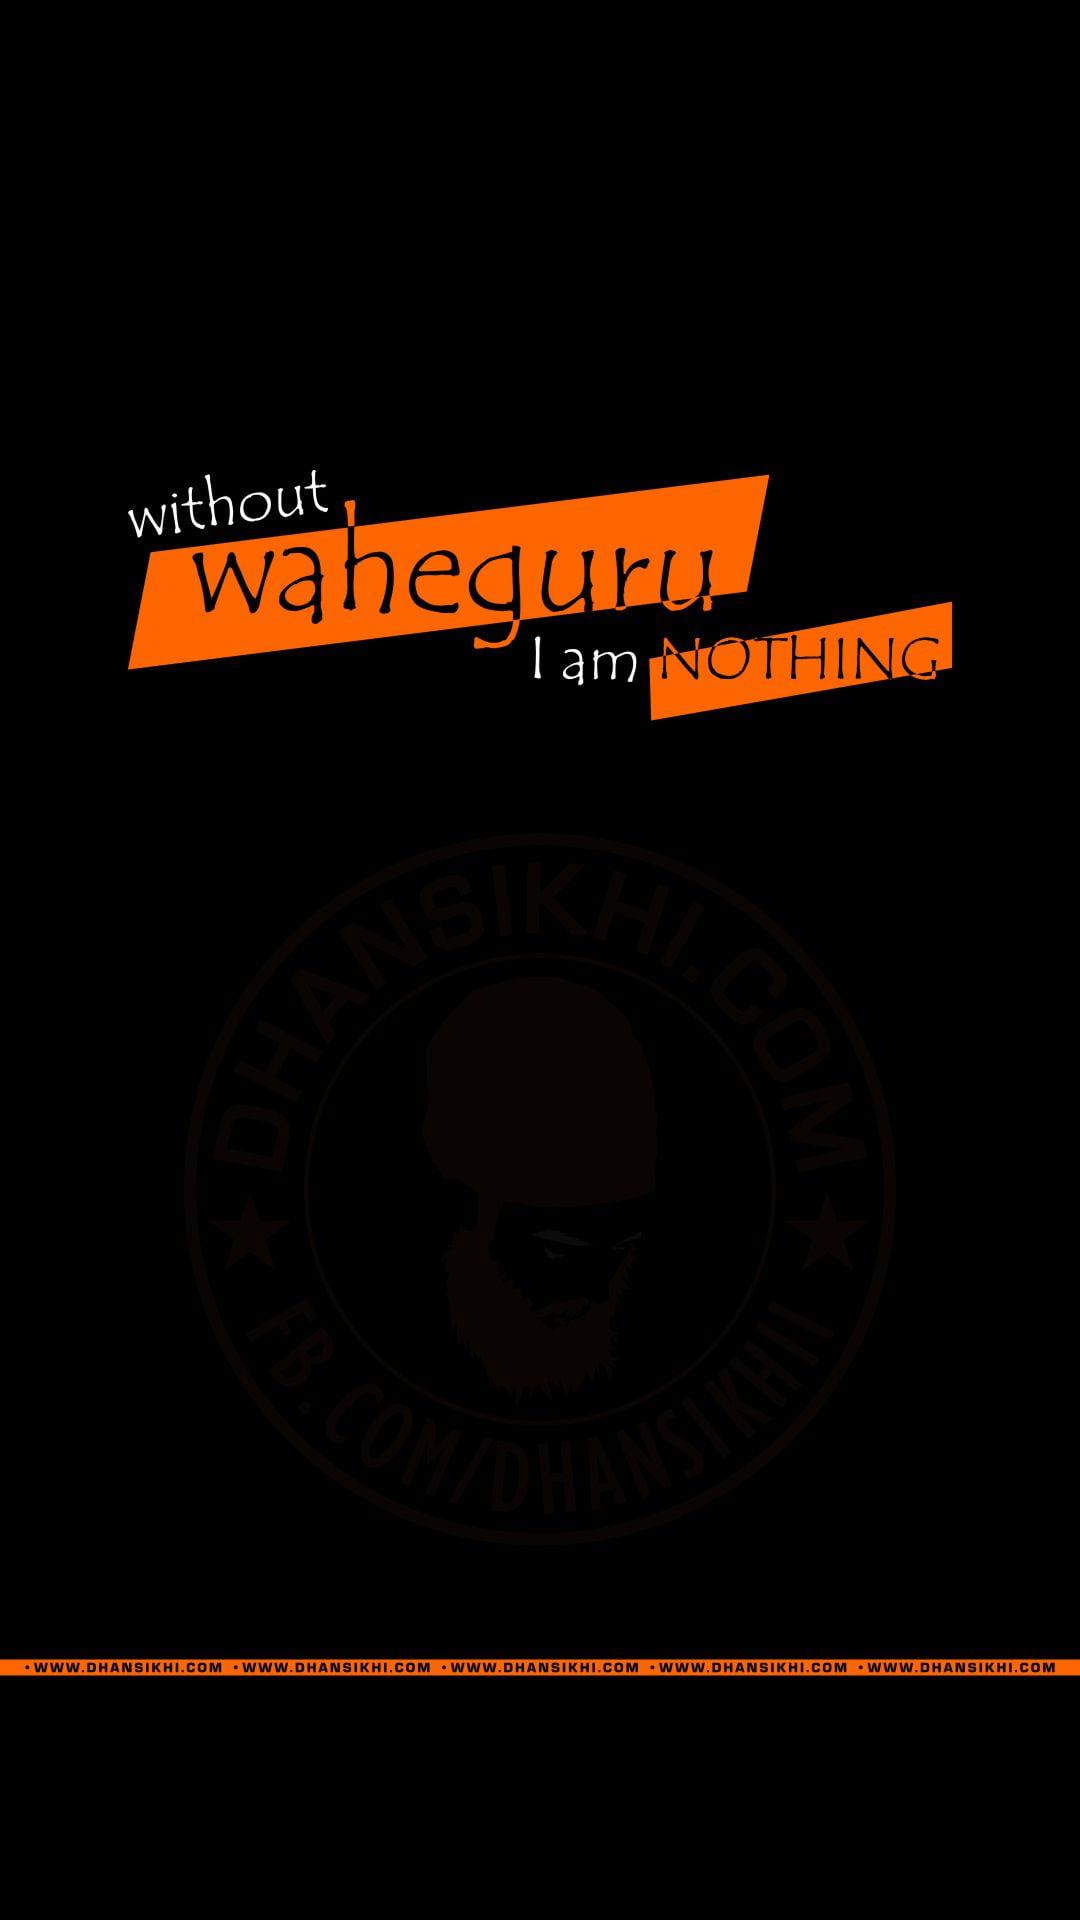 Mobile Wallpaper - Without Waheguru I Am Nothing